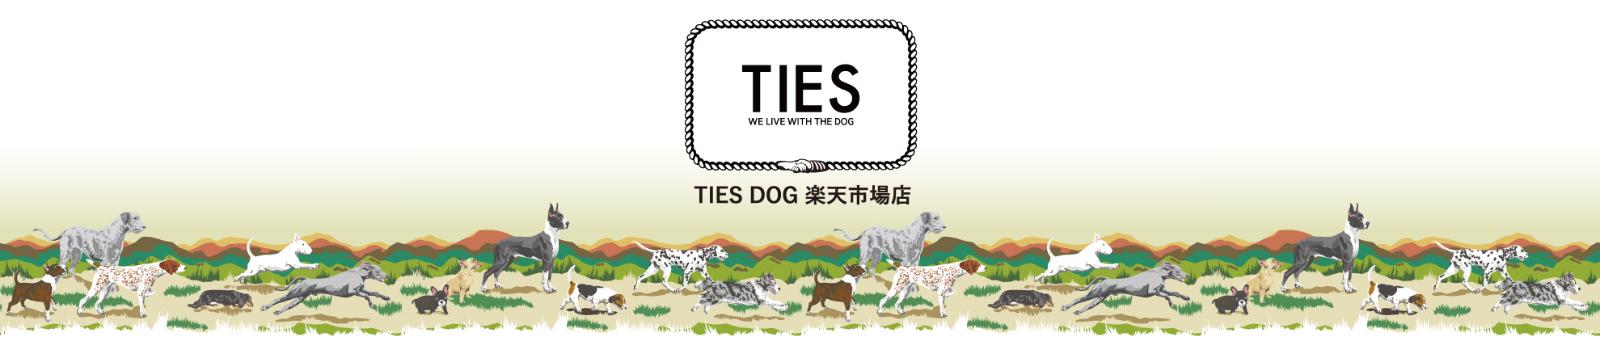 TIES DOG 楽天市場店:安心、安全、丈夫なオリジナル首輪&リードを展開するブランドです